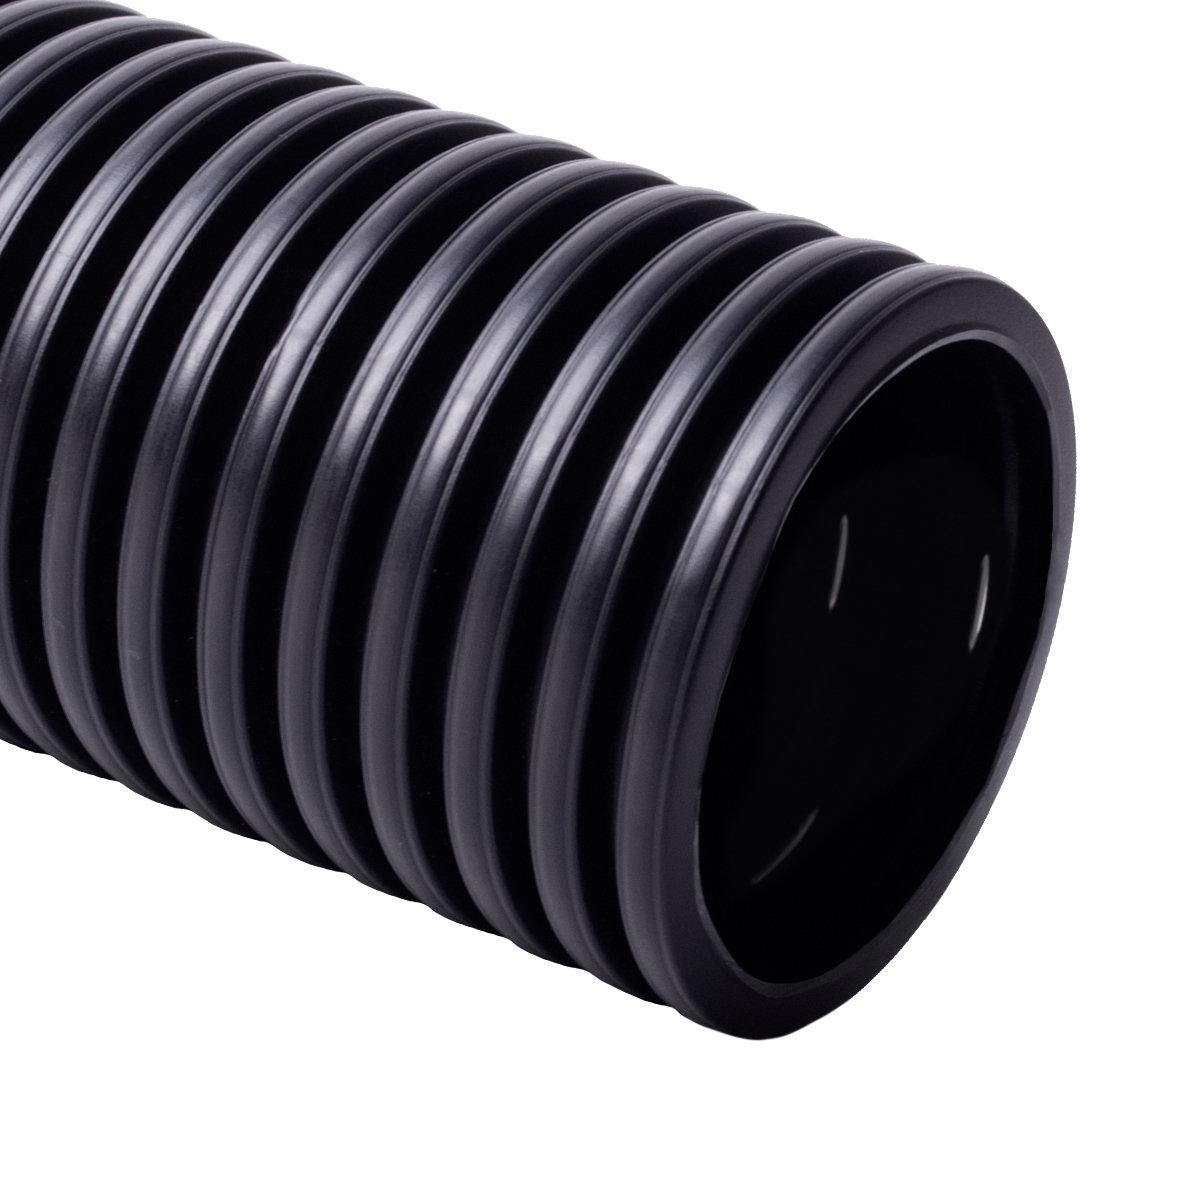 Труба дренажна 50 мм, чорна; одношарова; поліетилен; бухта  50 м